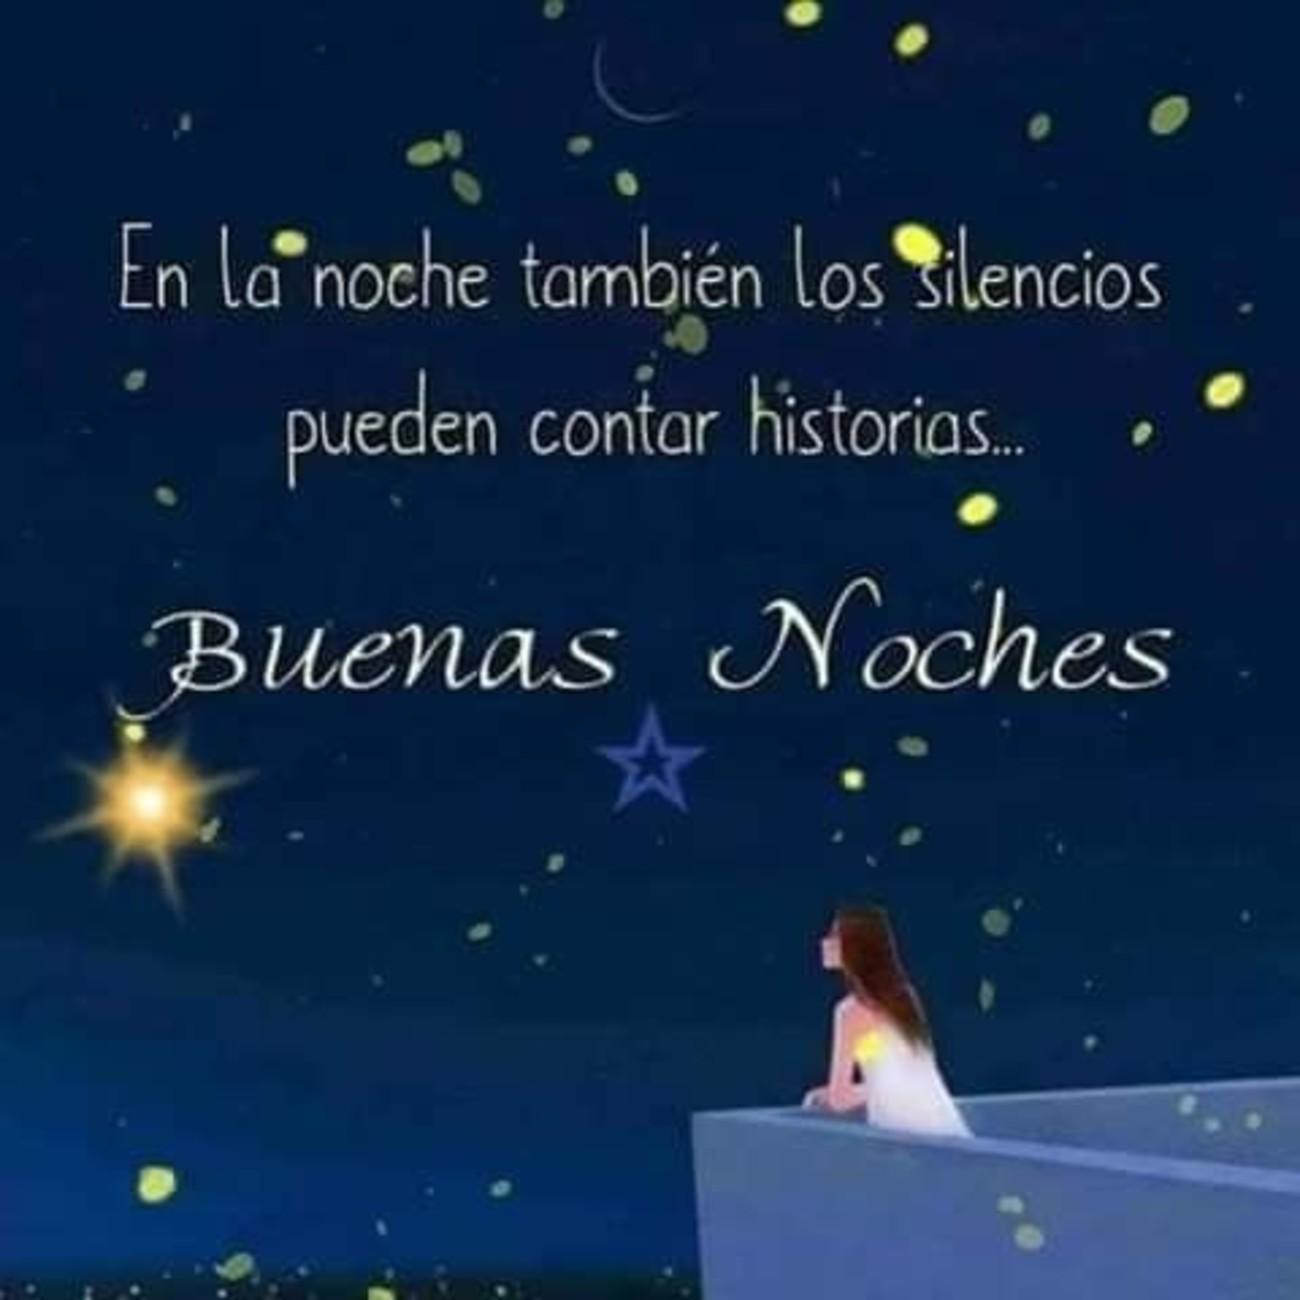 Buenas Noches Frases 796 Bonitasimagenesnet